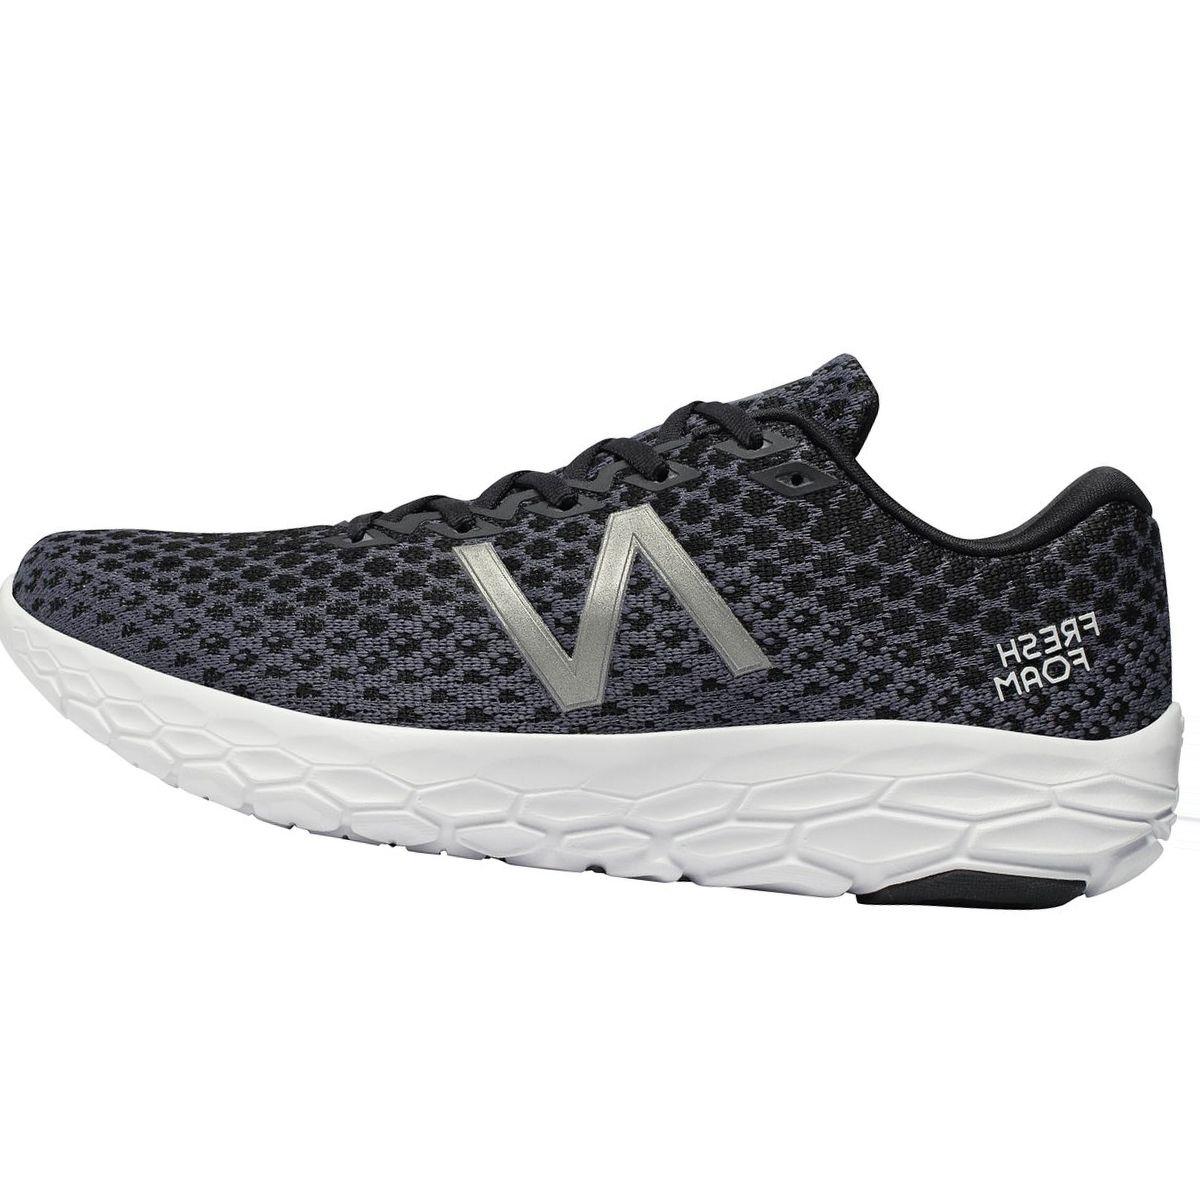 New Balance Fresh Foam Beacon Running Shoe - Men's